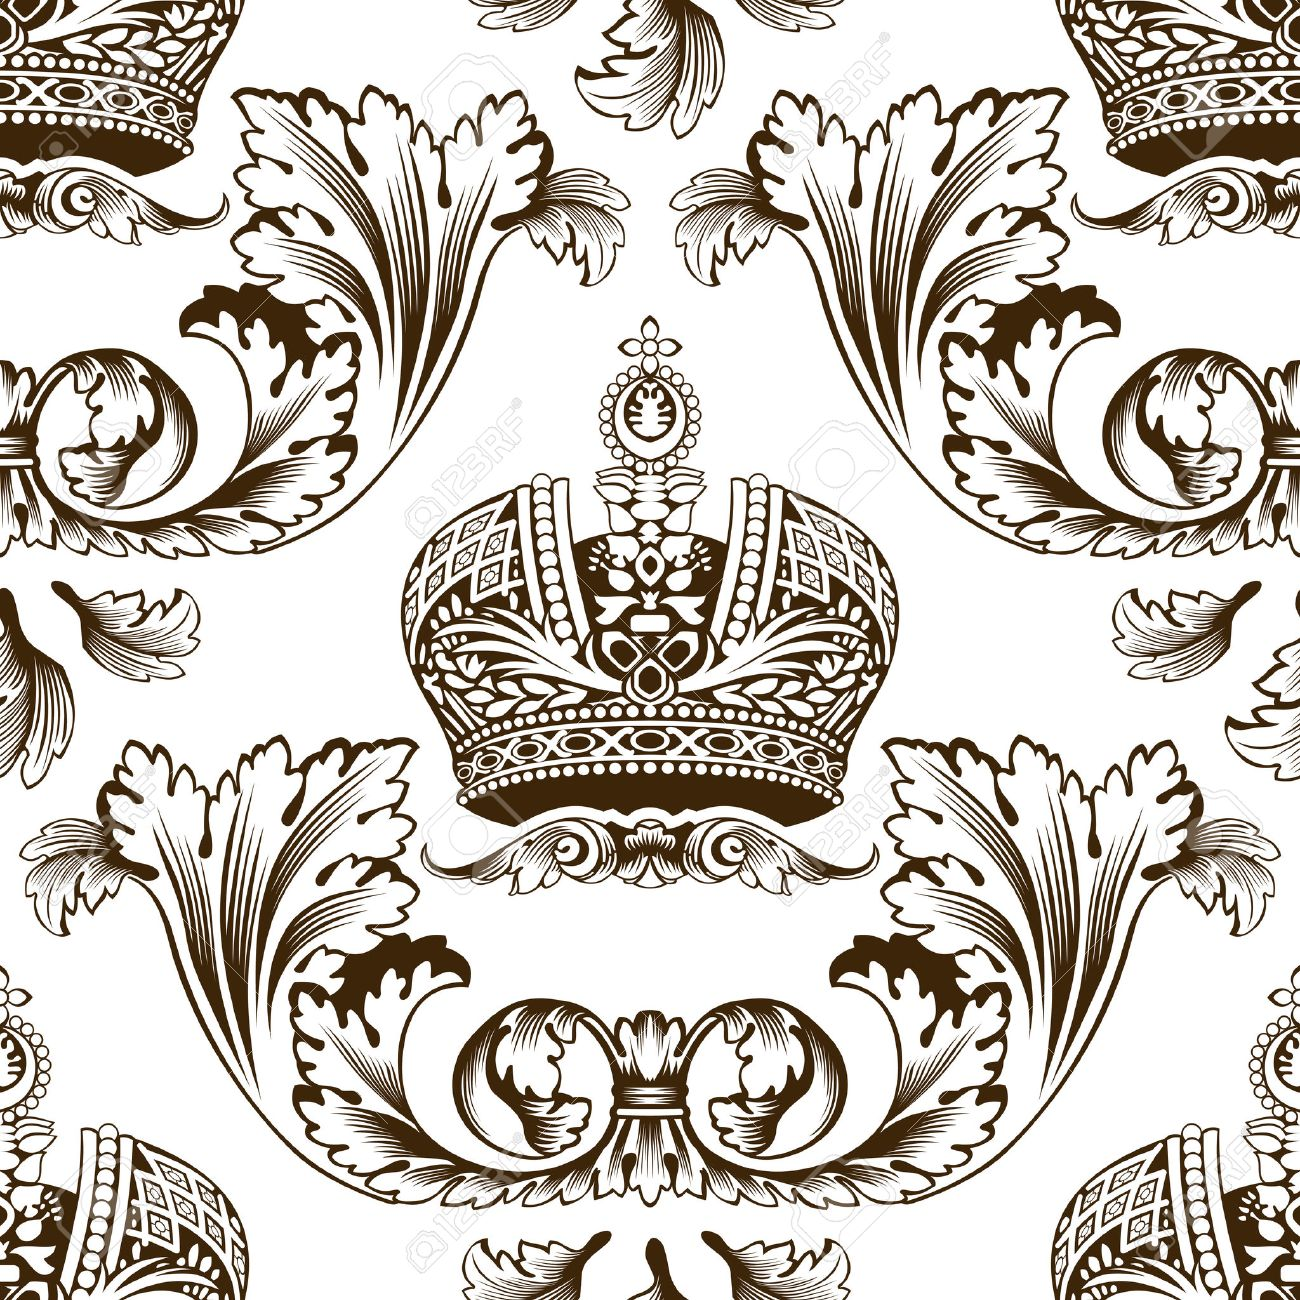 New seamless decor imperial ornament. Vector illustration Stock Vector - 6079279